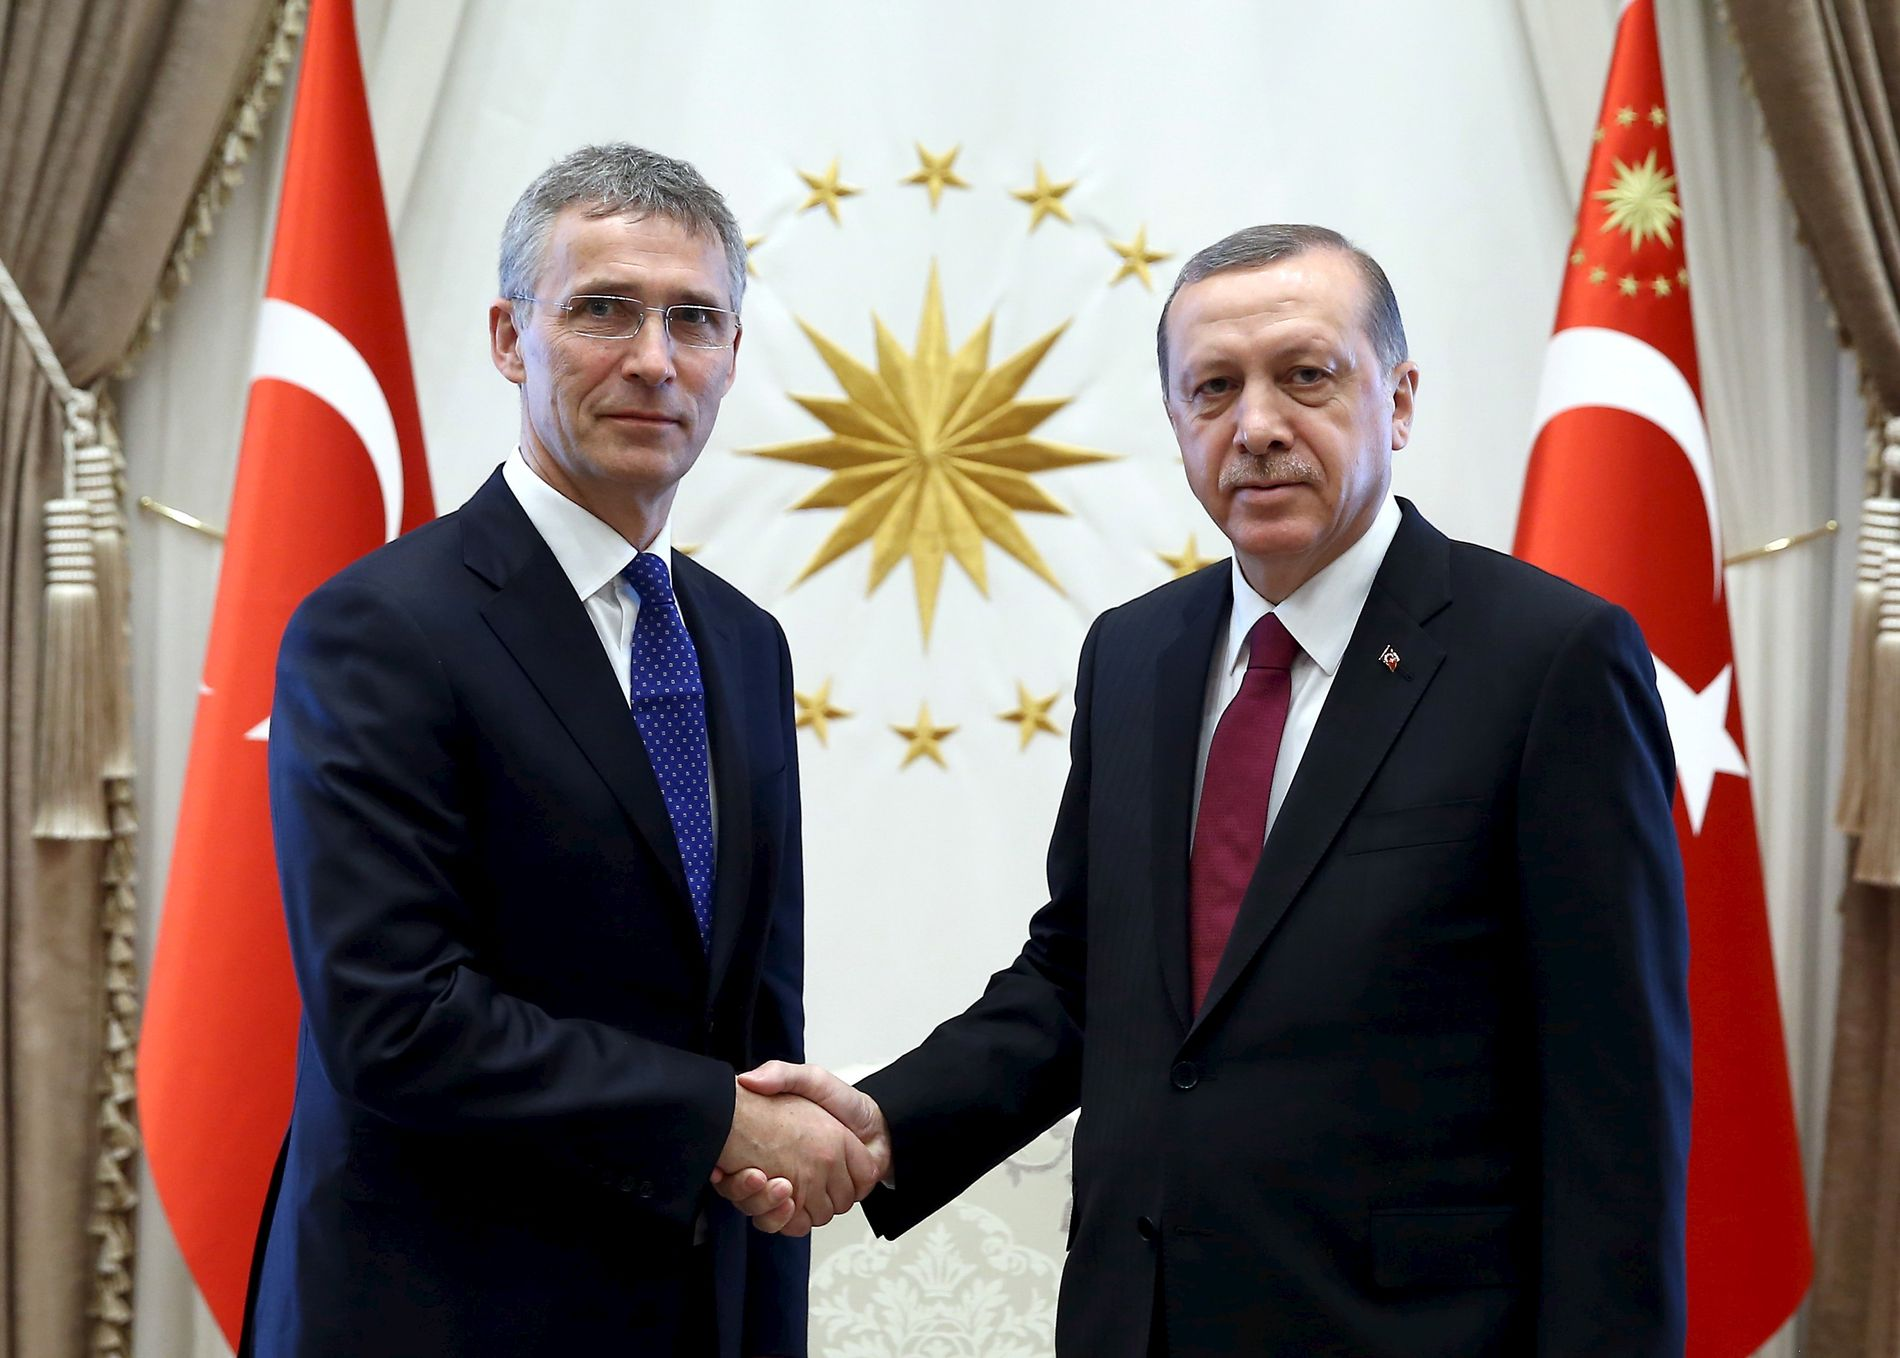 MØTE I TYRKIA: NATOs generalsekretær Jens Stoltenberg og Tyrkias president Recep Tayyip Erdogan under et møte i Ankara høsten 2017.